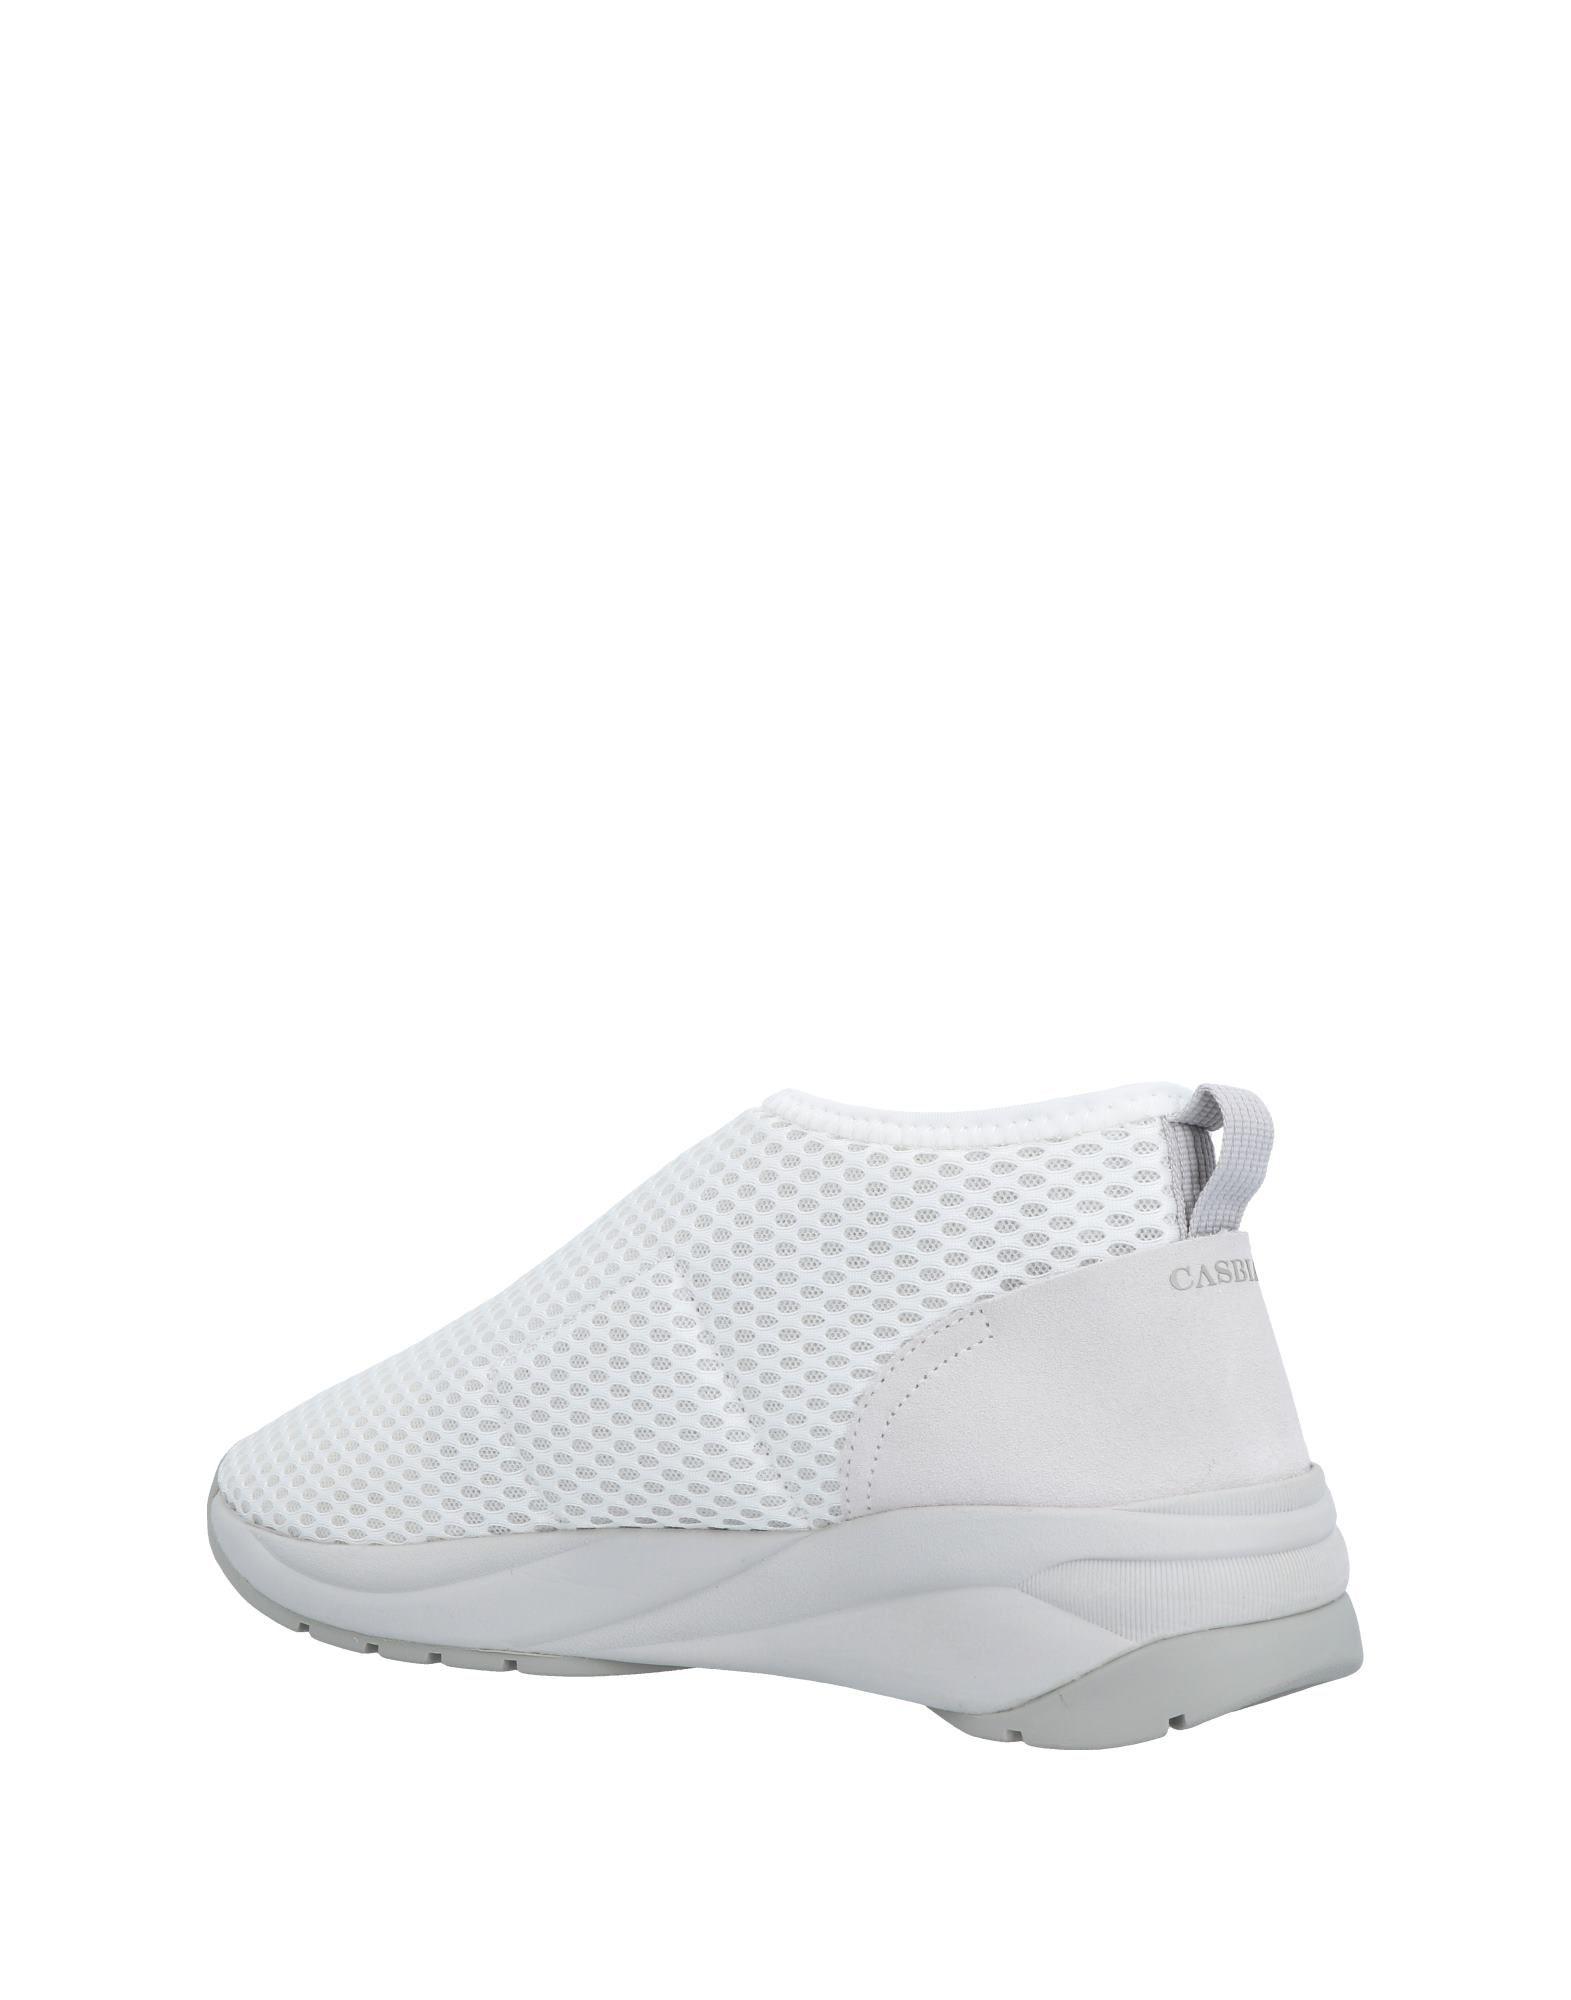 Rabatt Herren echte Schuhe Casbia Sneakers Herren Rabatt  11485899KA 3a4564